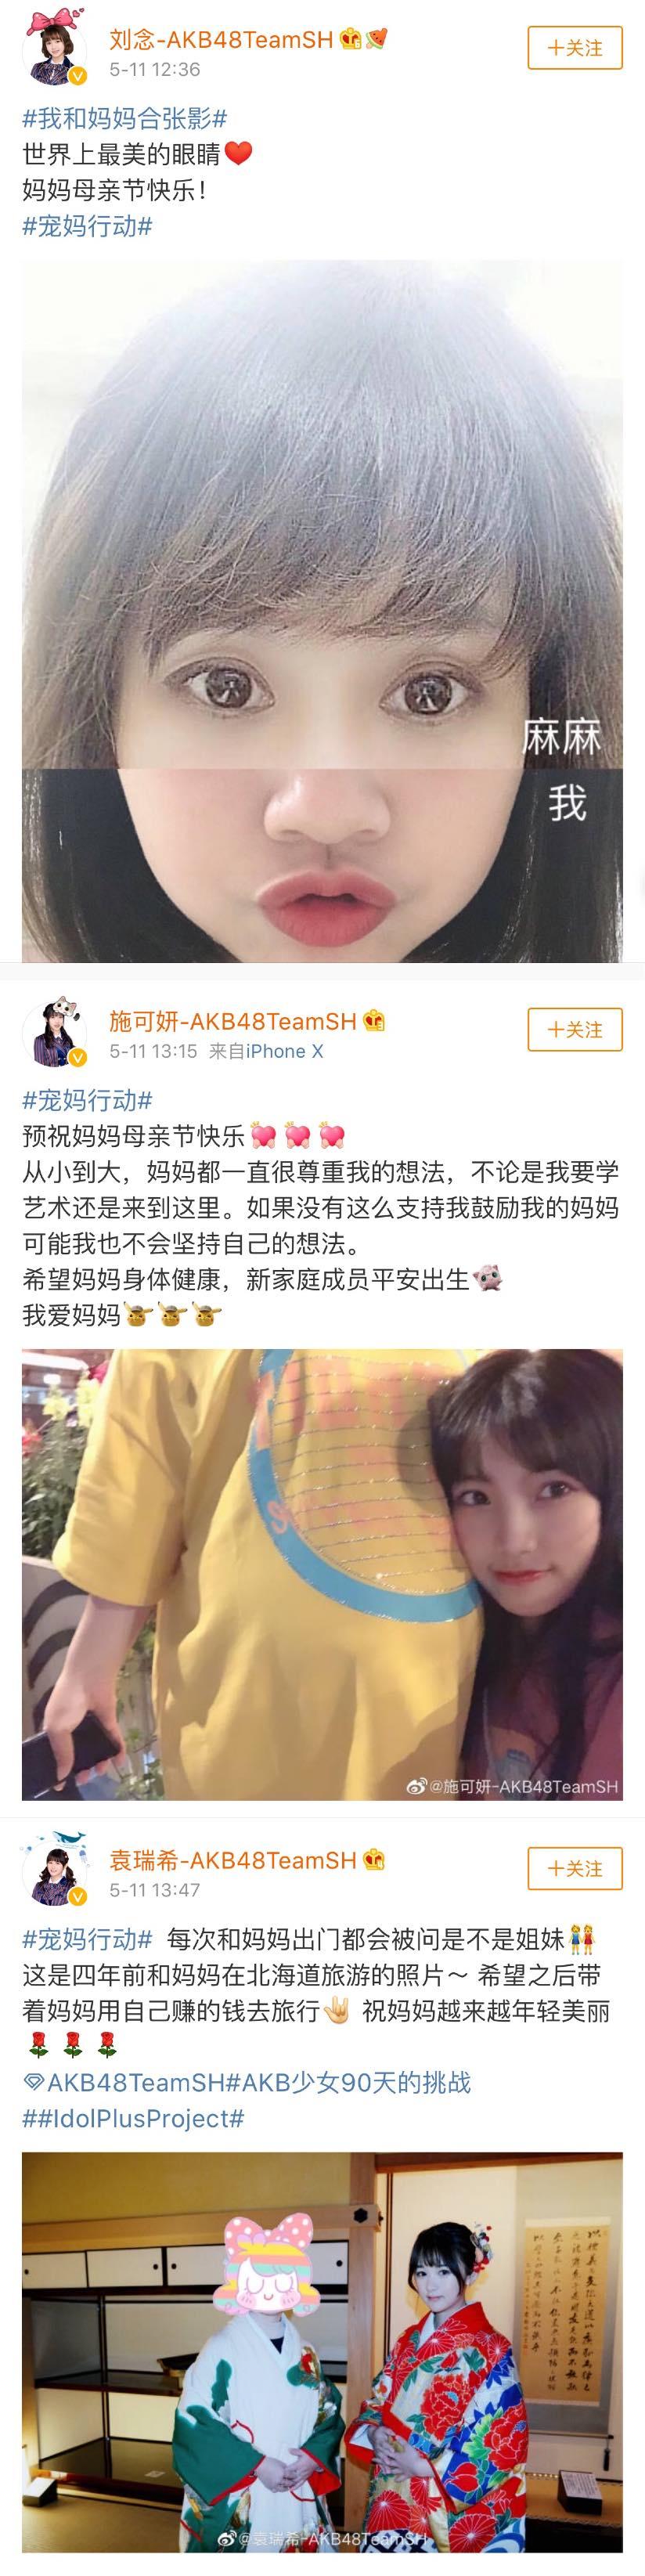 AKB48 Team SH成员发博表白母亲(八).jpg